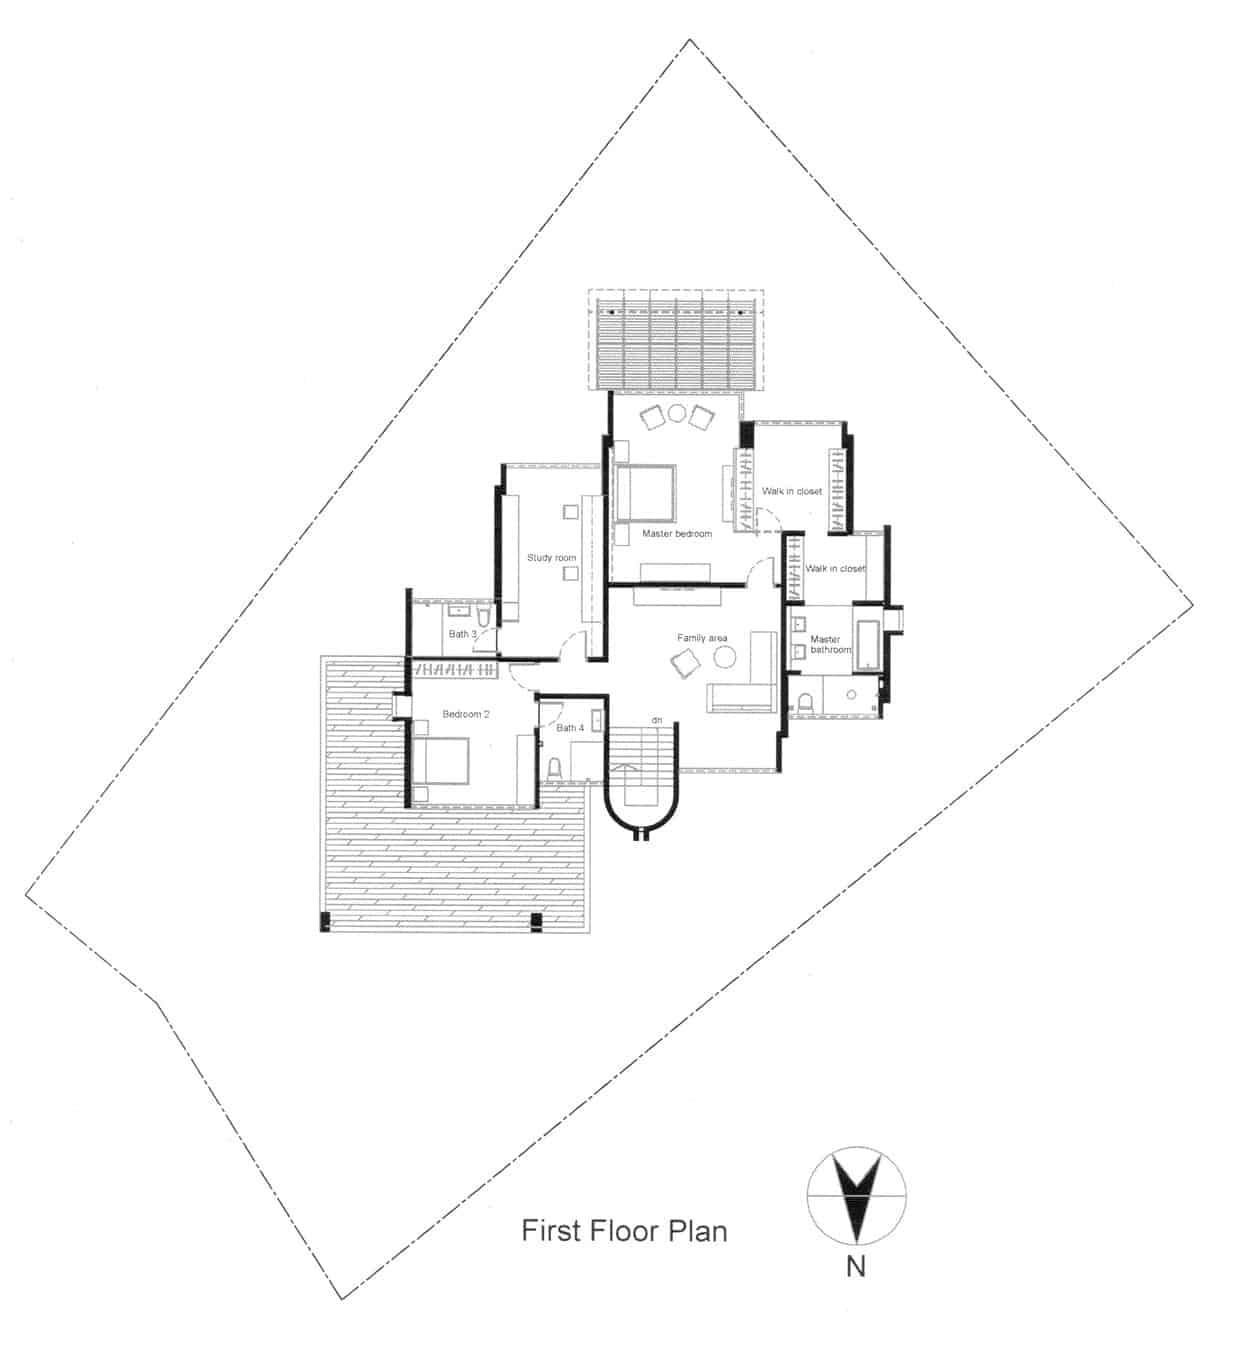 Hillside Bungalow Remodel by Interlink Design Solutions (27)